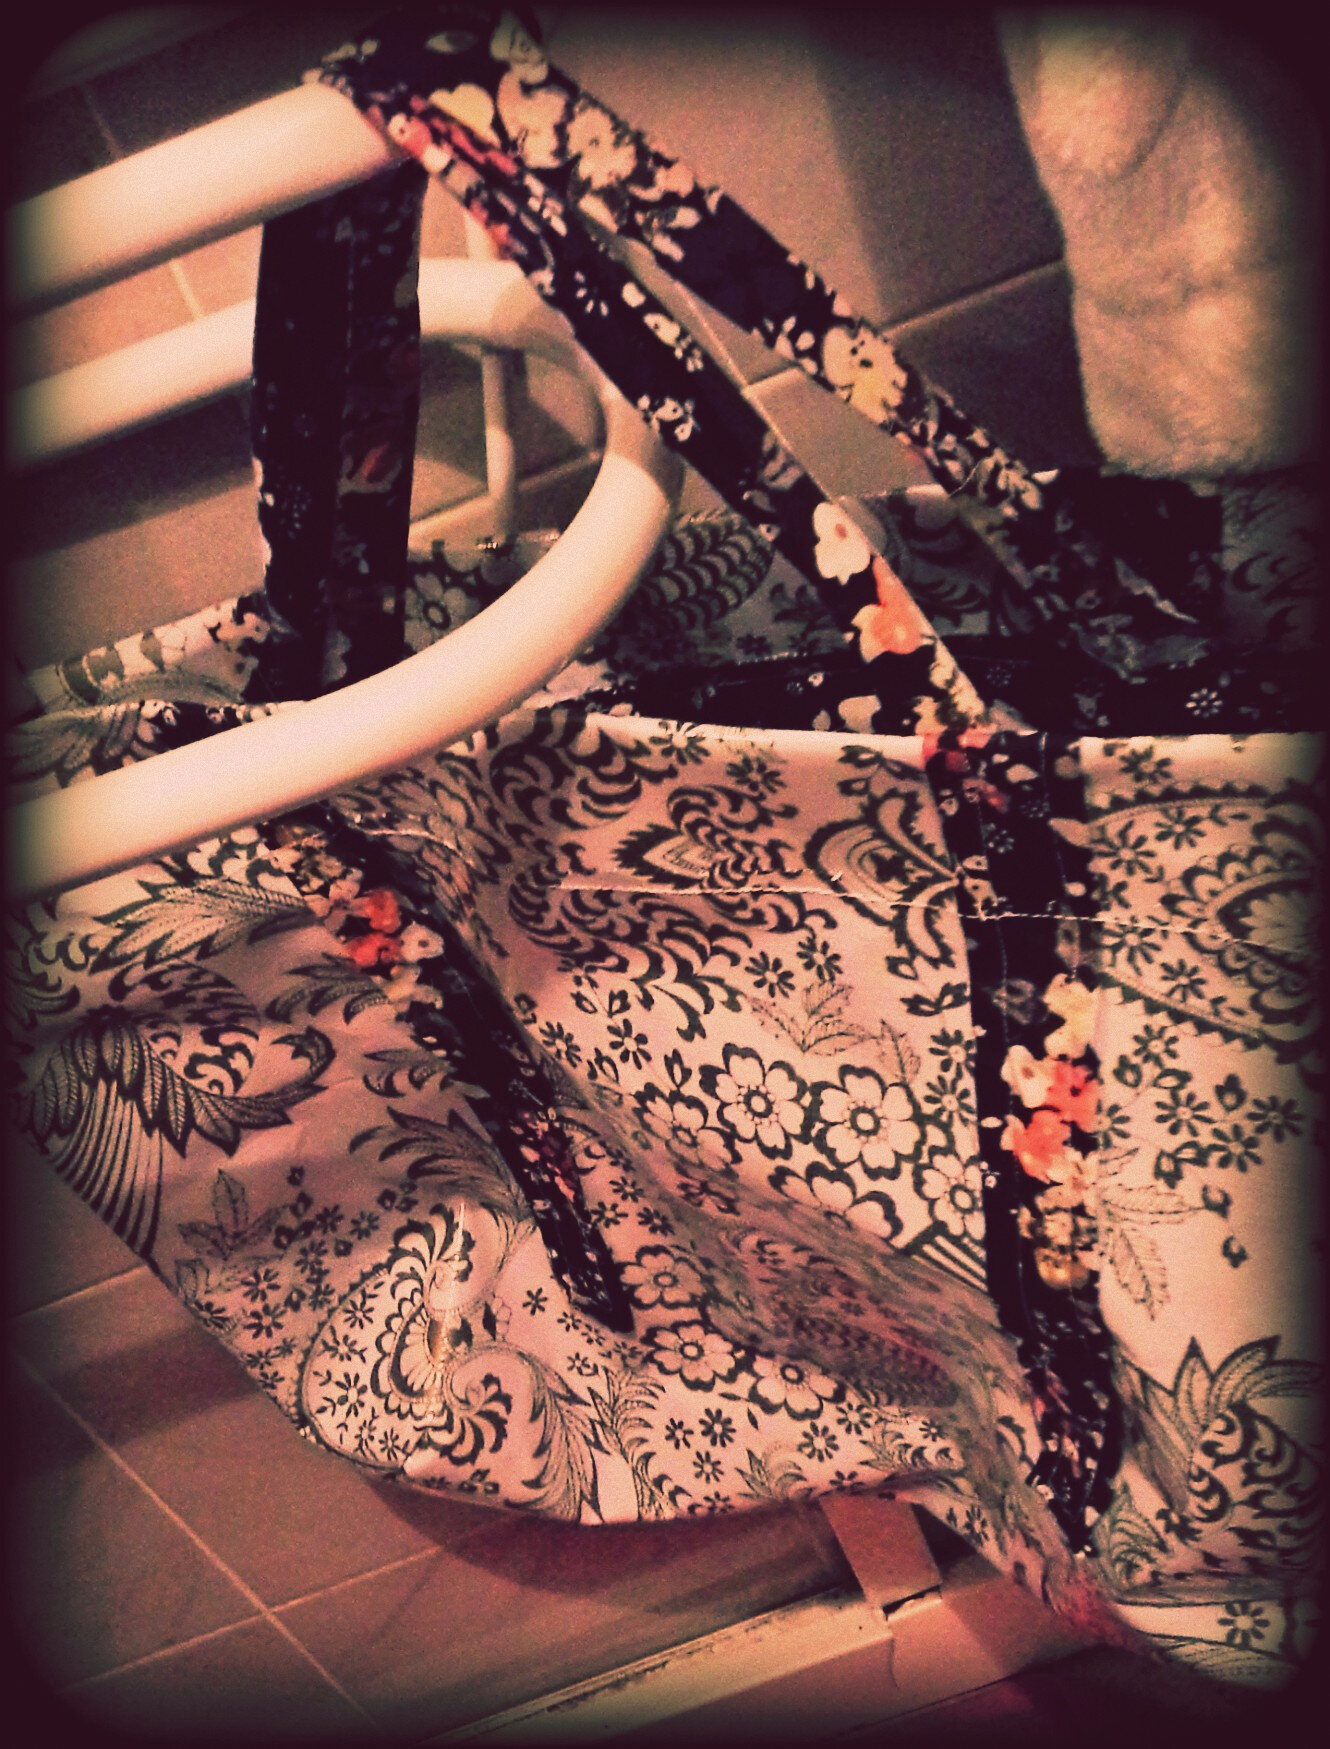 Mon sac de tricot cousu main